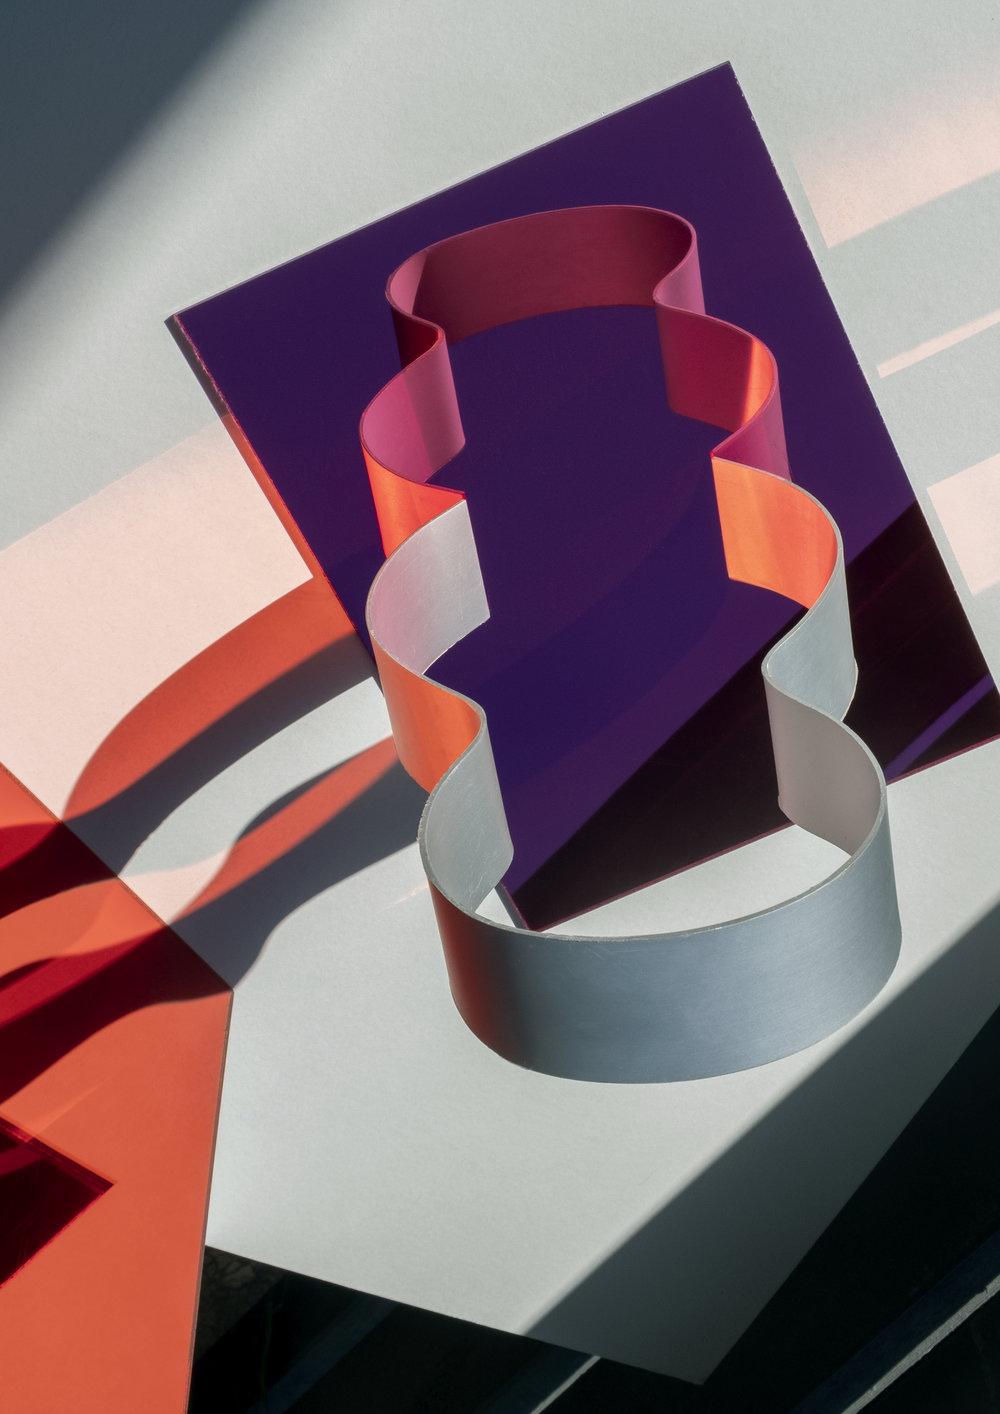 Copy of Julia Burke_ Rhythmic (Ribbon#2)_Archival print mounted on MDF_ 42cm x 60cm.jpg